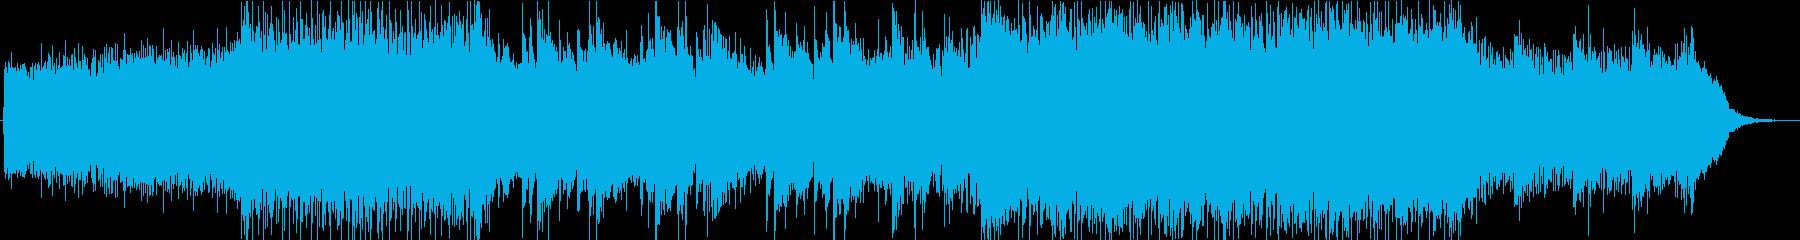 japanese hacksの再生済みの波形